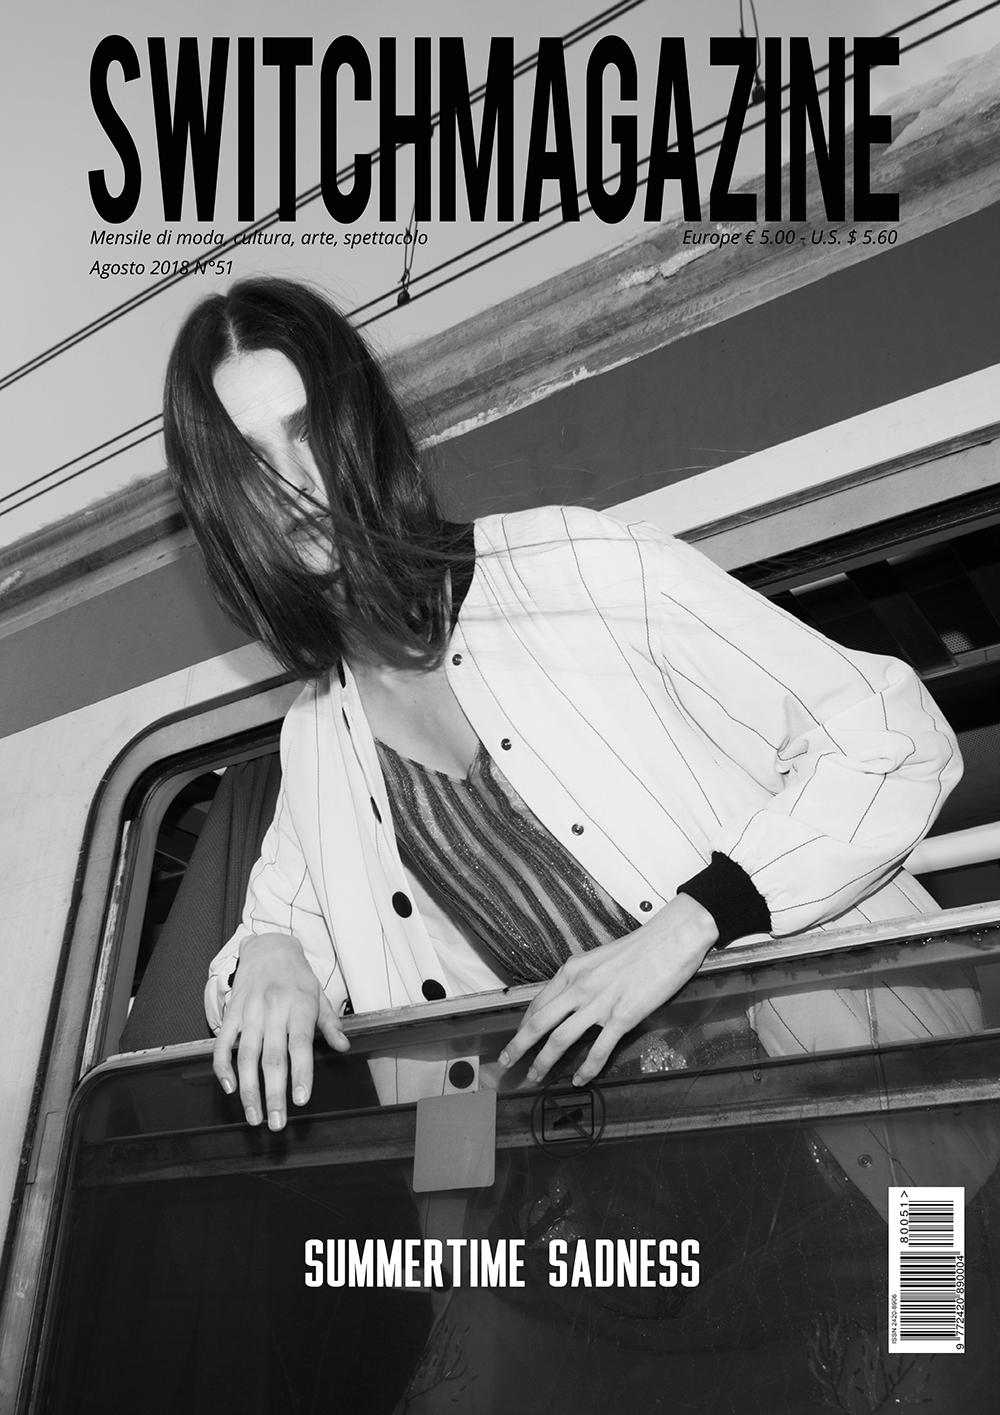 Switchmagazine